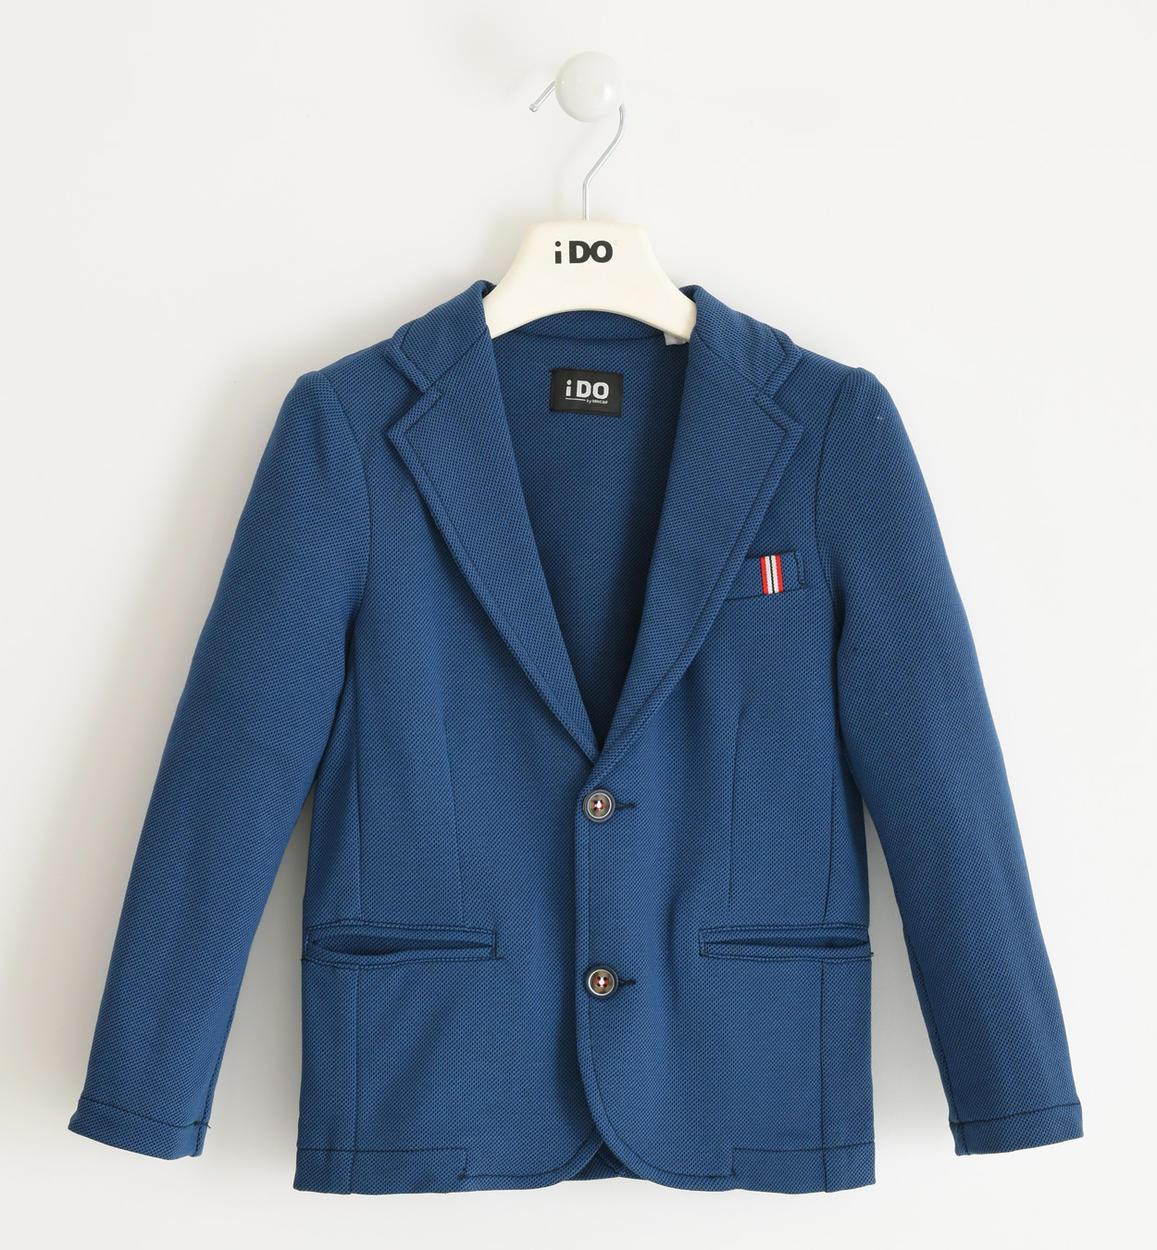 giacca in felpa micro pois per bambino d avion fronte 01 2744j46200 6mc6